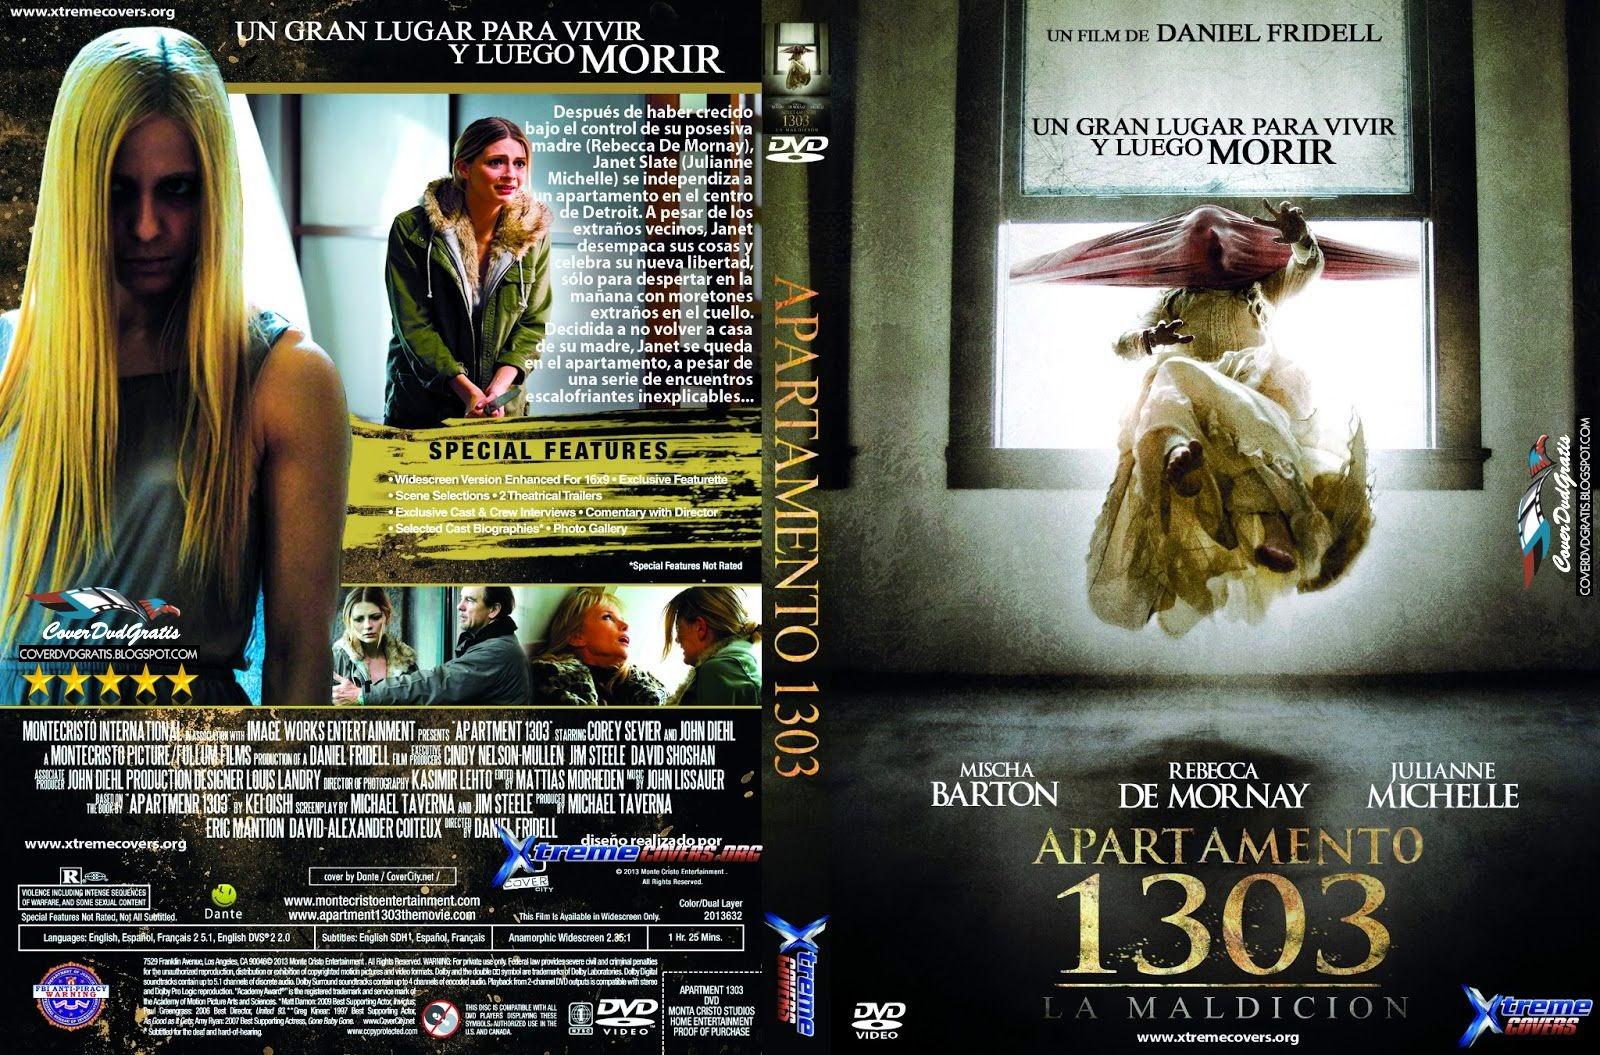 Apartment 1303 3D 2013 DVD COVER - CoverDvdGratis